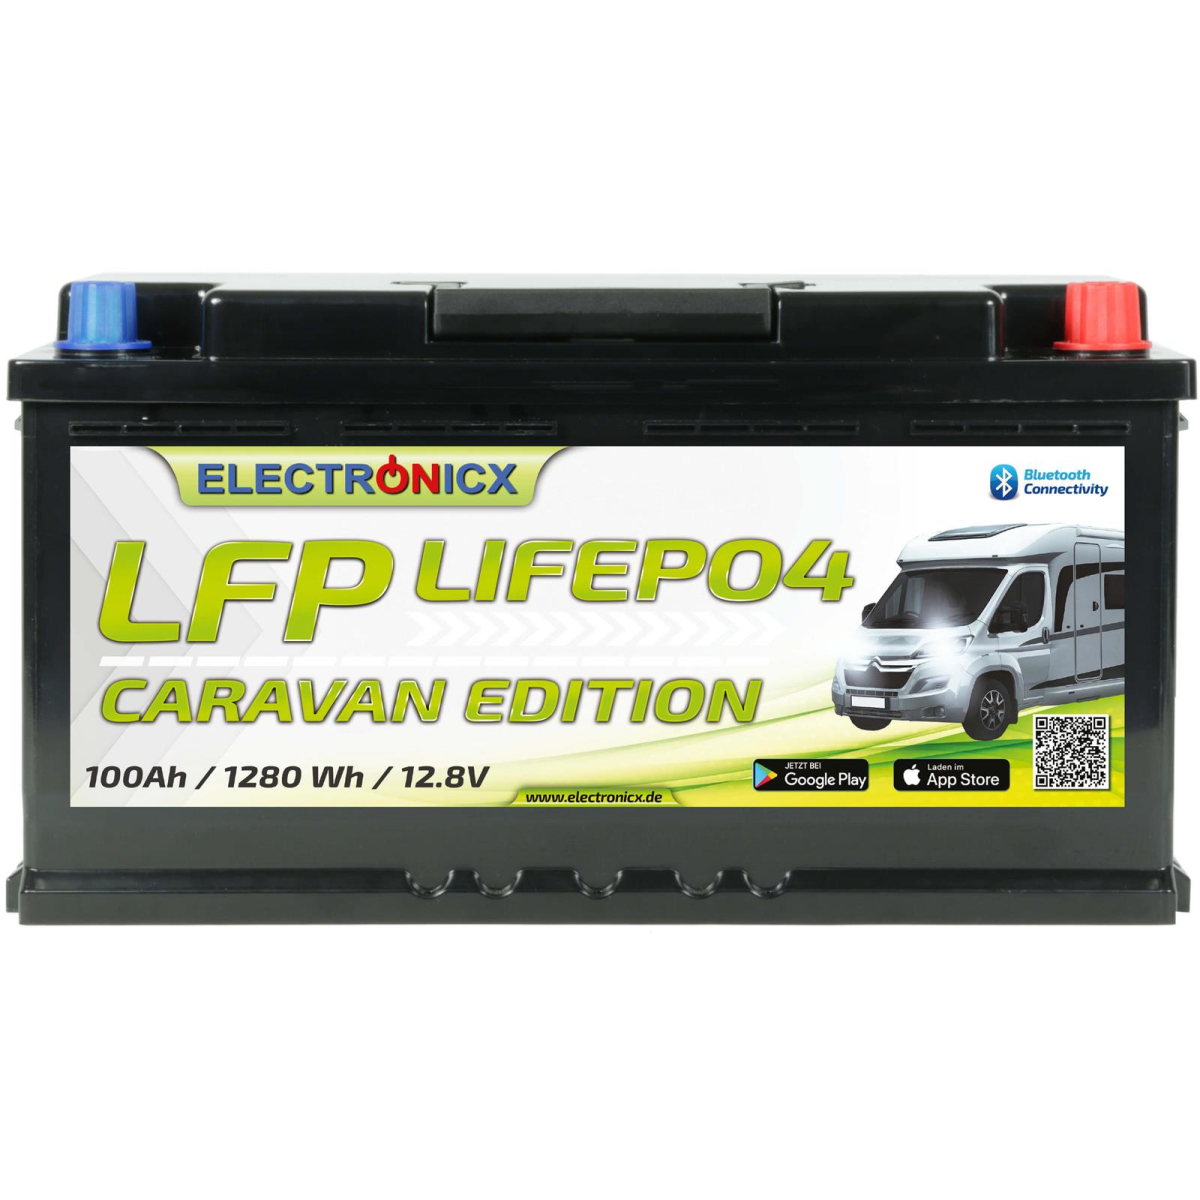 Electronicx Caravan Edition LiFePO4 Akku 12V 100Ah LFP Bluetooth APP Lithium-Eisenphosphat